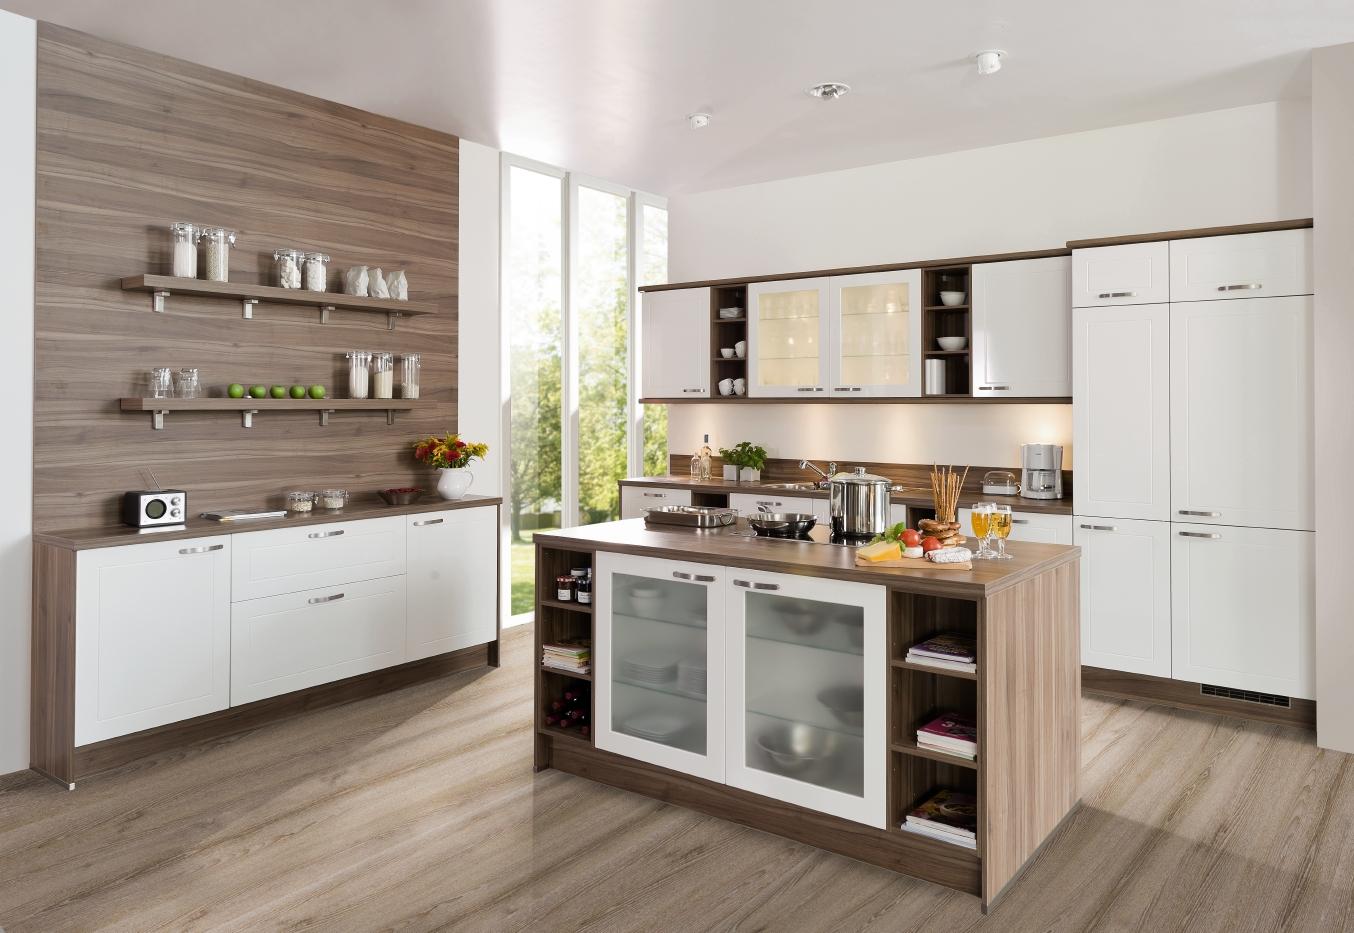 Express Küchen - Müllers Küche